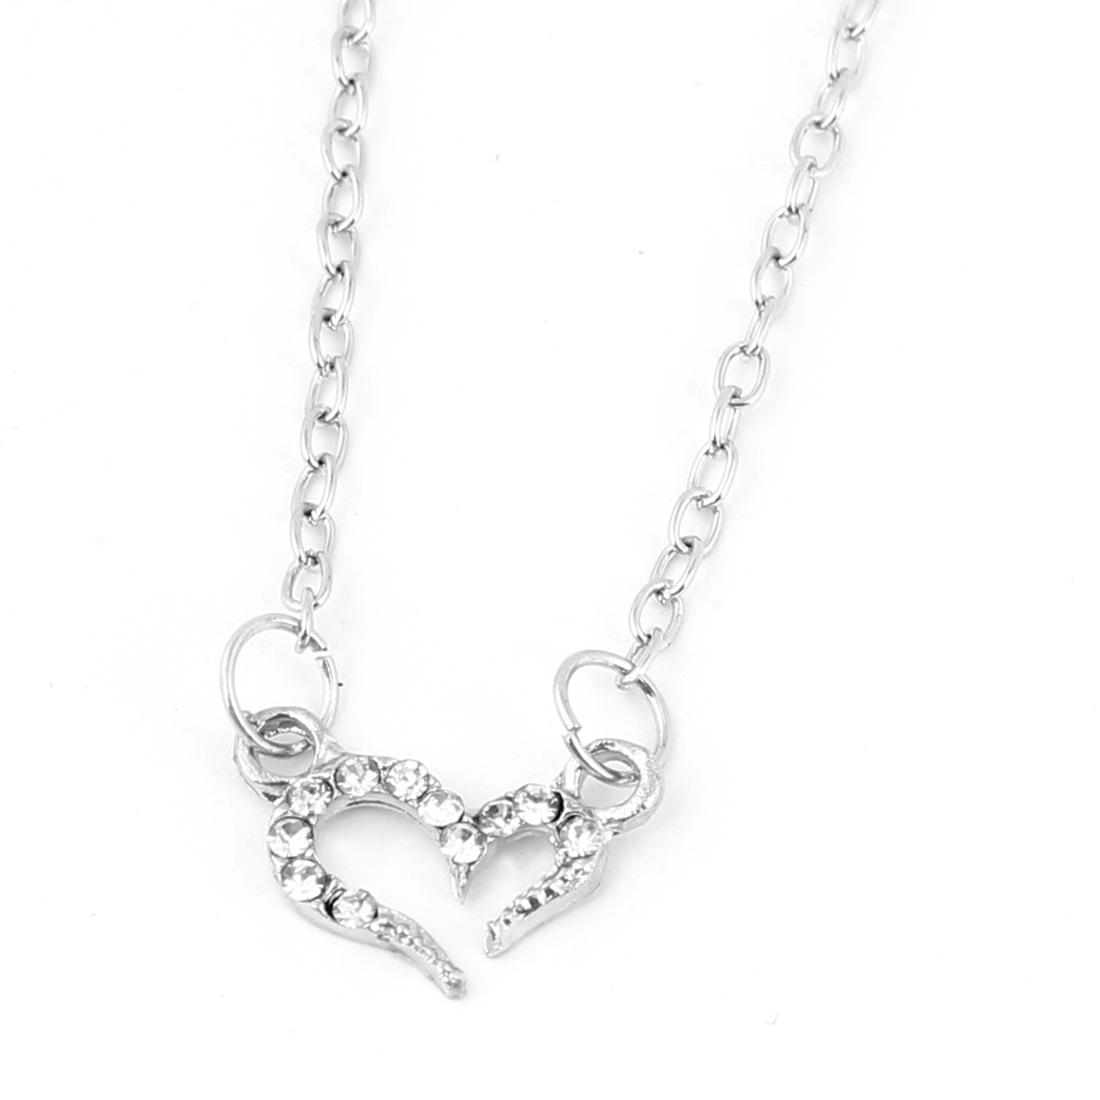 Lady Silver Tone Shiny Rhinestones Inlaid Wishing Love Pendant Necklace